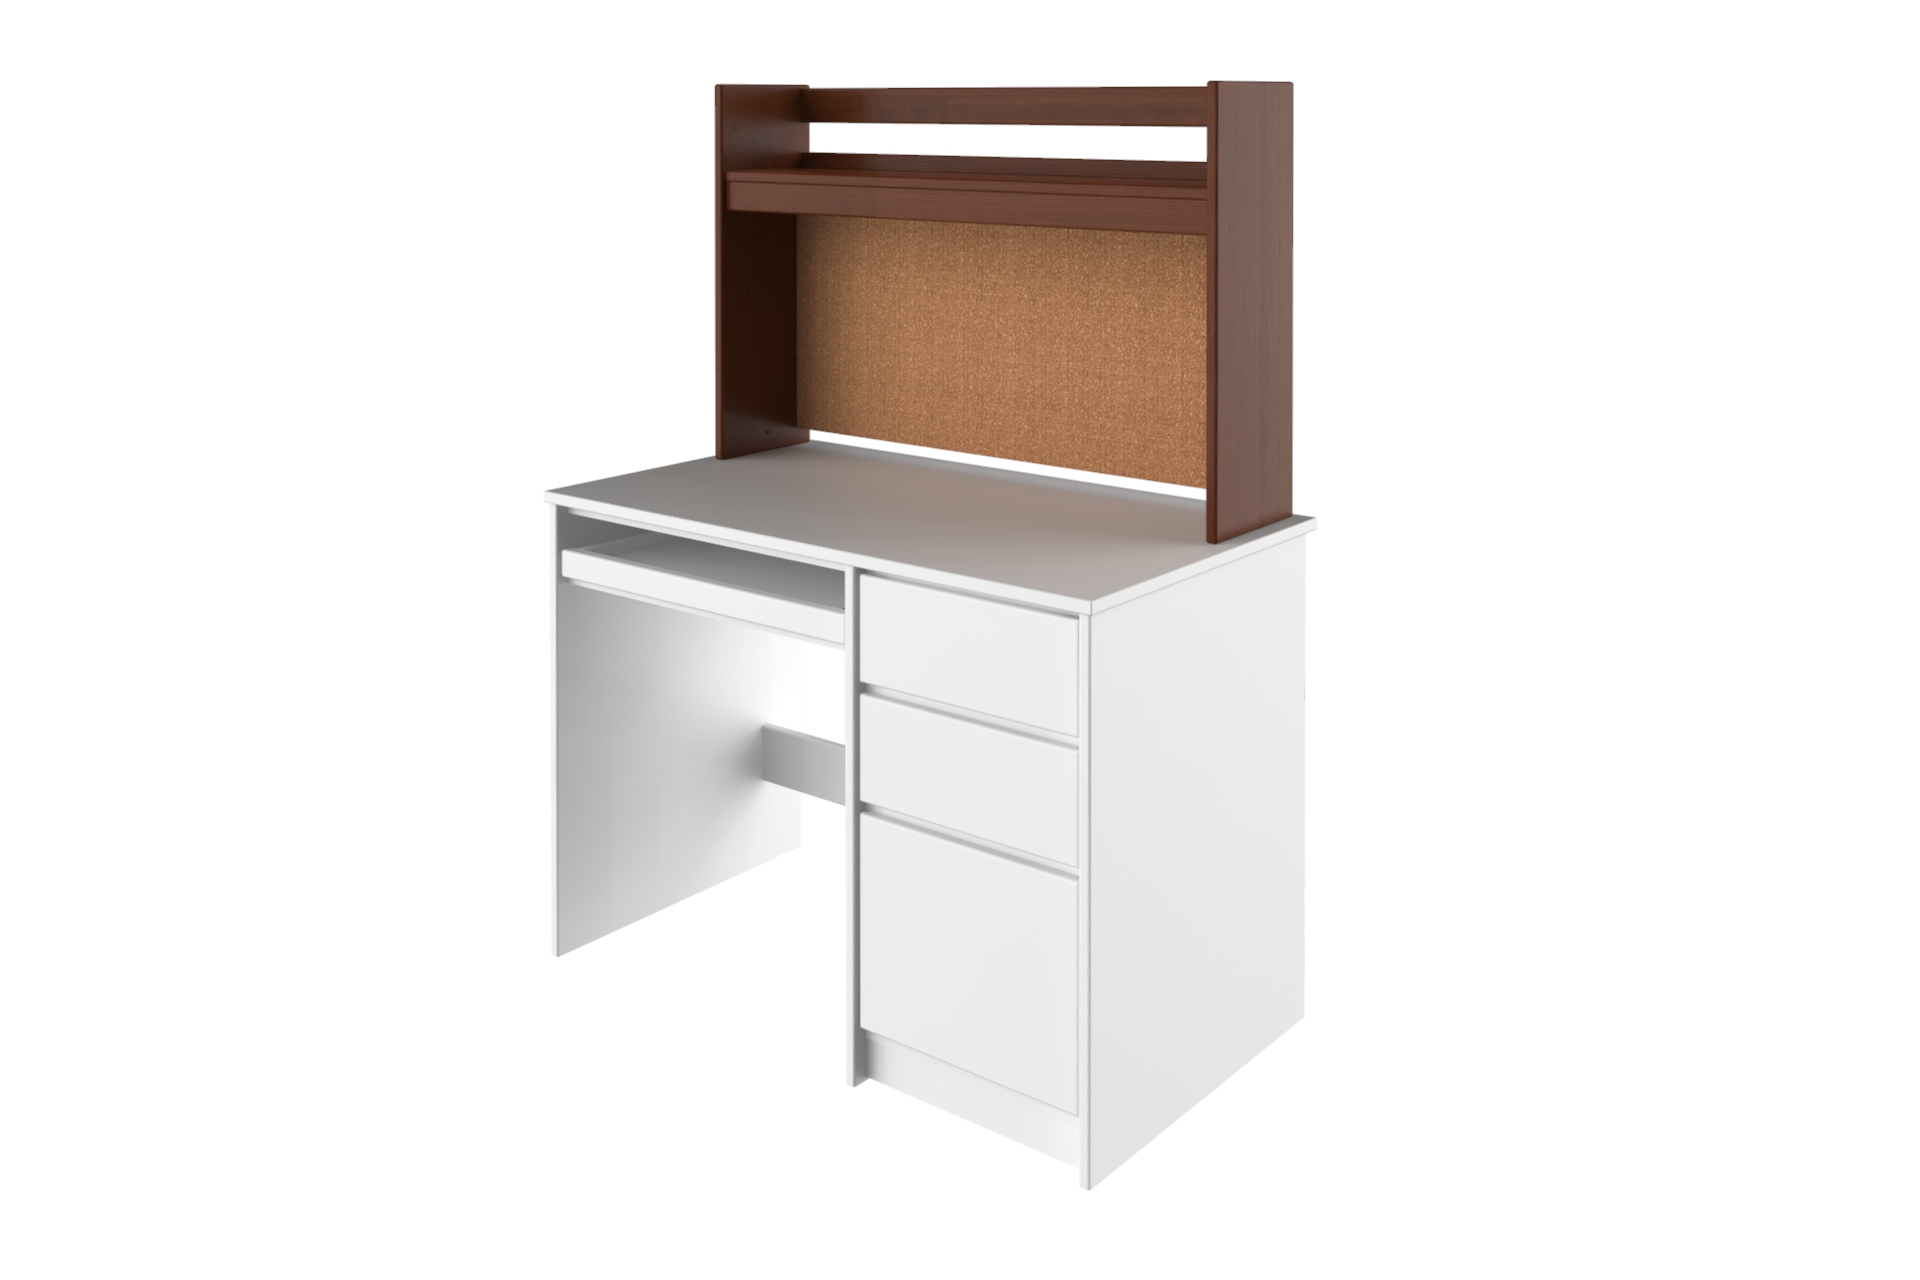 Compatible with most Desks